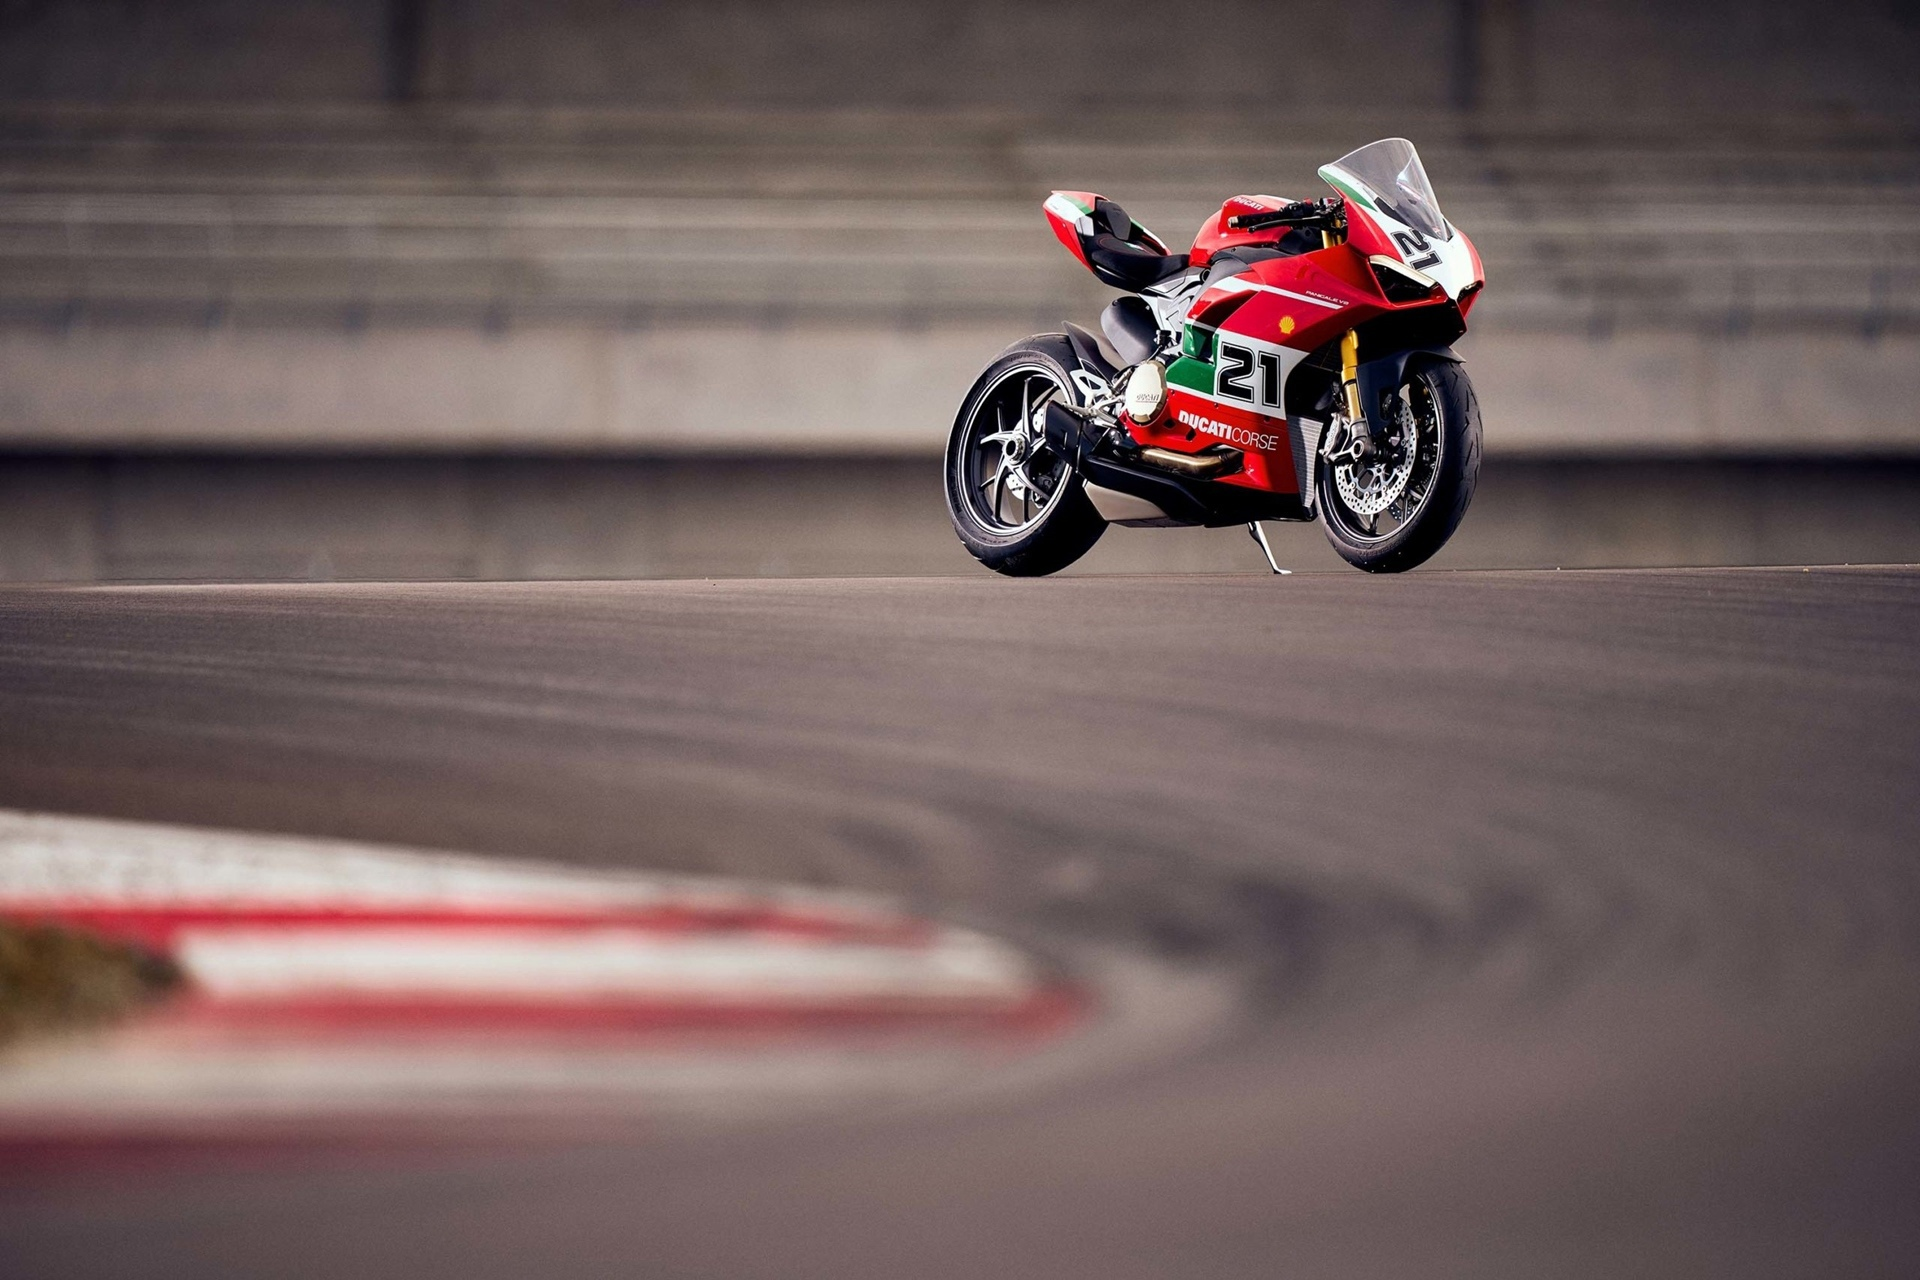 Спортбайк Ducati Panigale V2 Bayliss 1st Champion 20th Anniversary (66 фото)